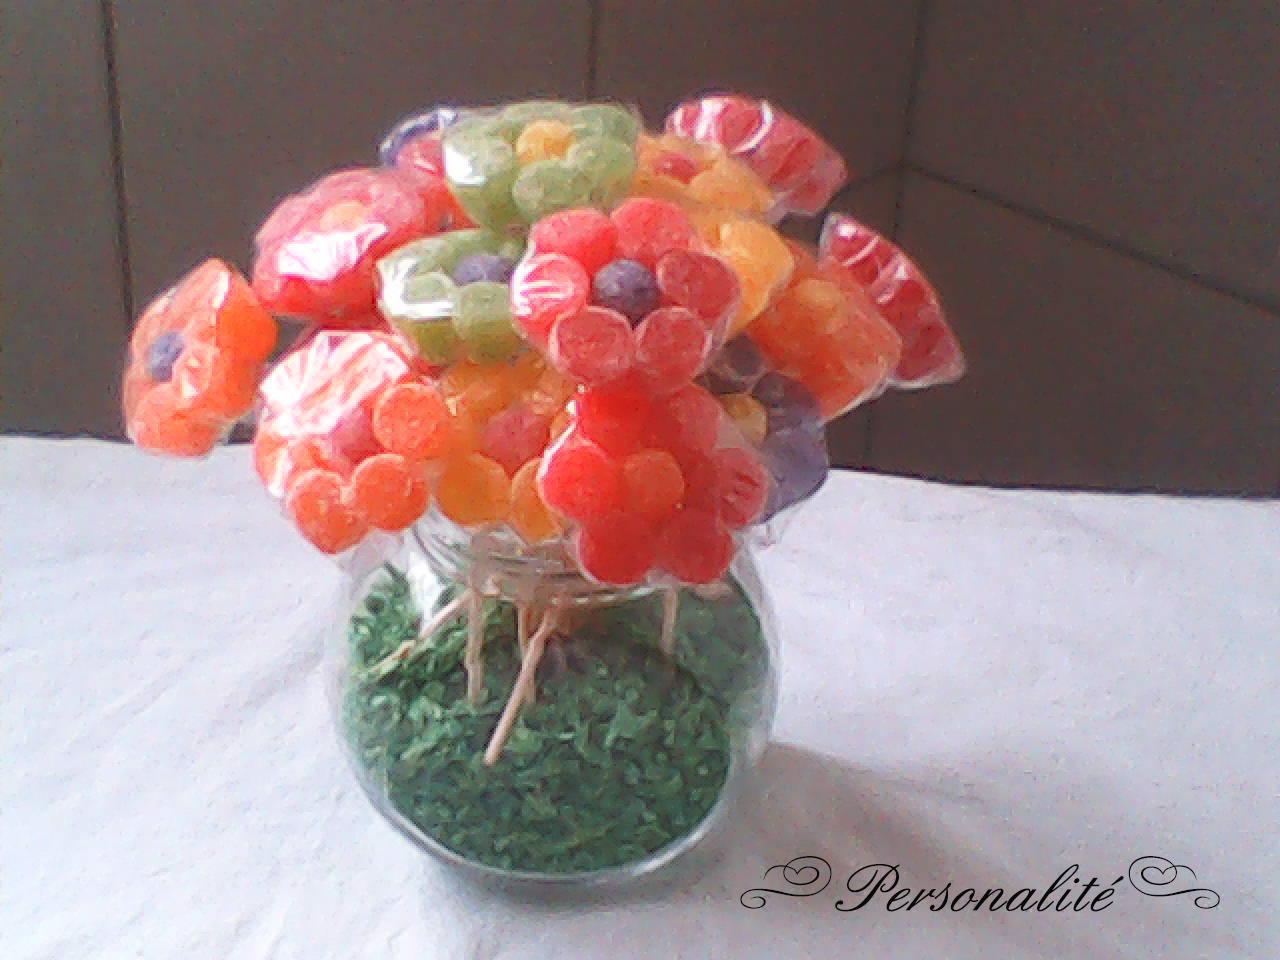 Preferência Personalité : Flores de Jujuba RM86